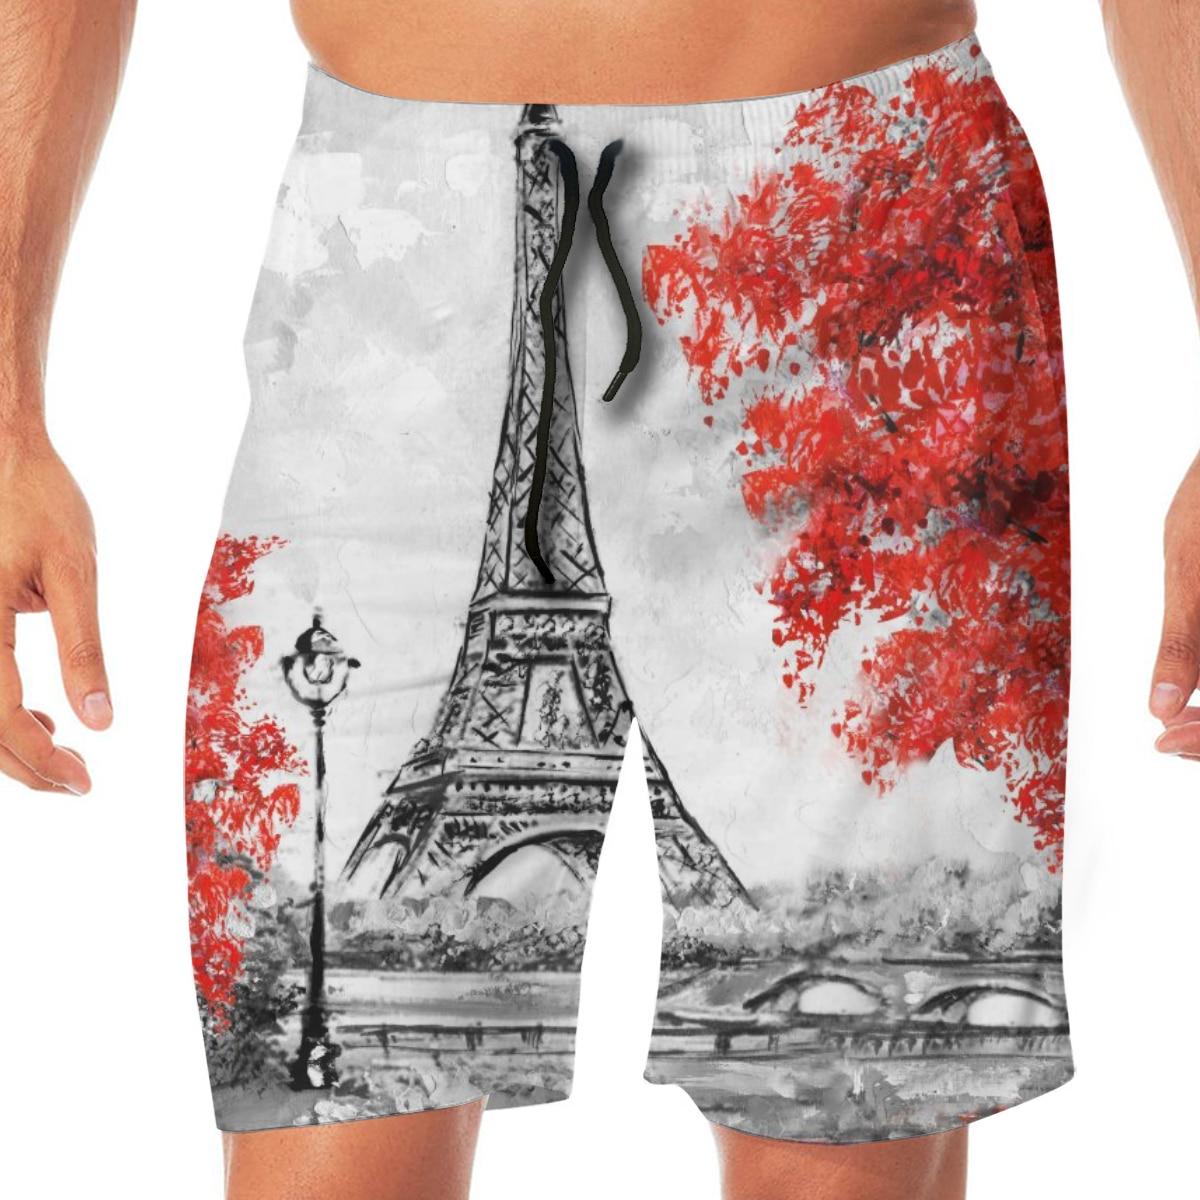 Men Casual Summer Hawaiian Beach Pants Half Trousers Couple Under Umbrella On Eiffel Tower Painting